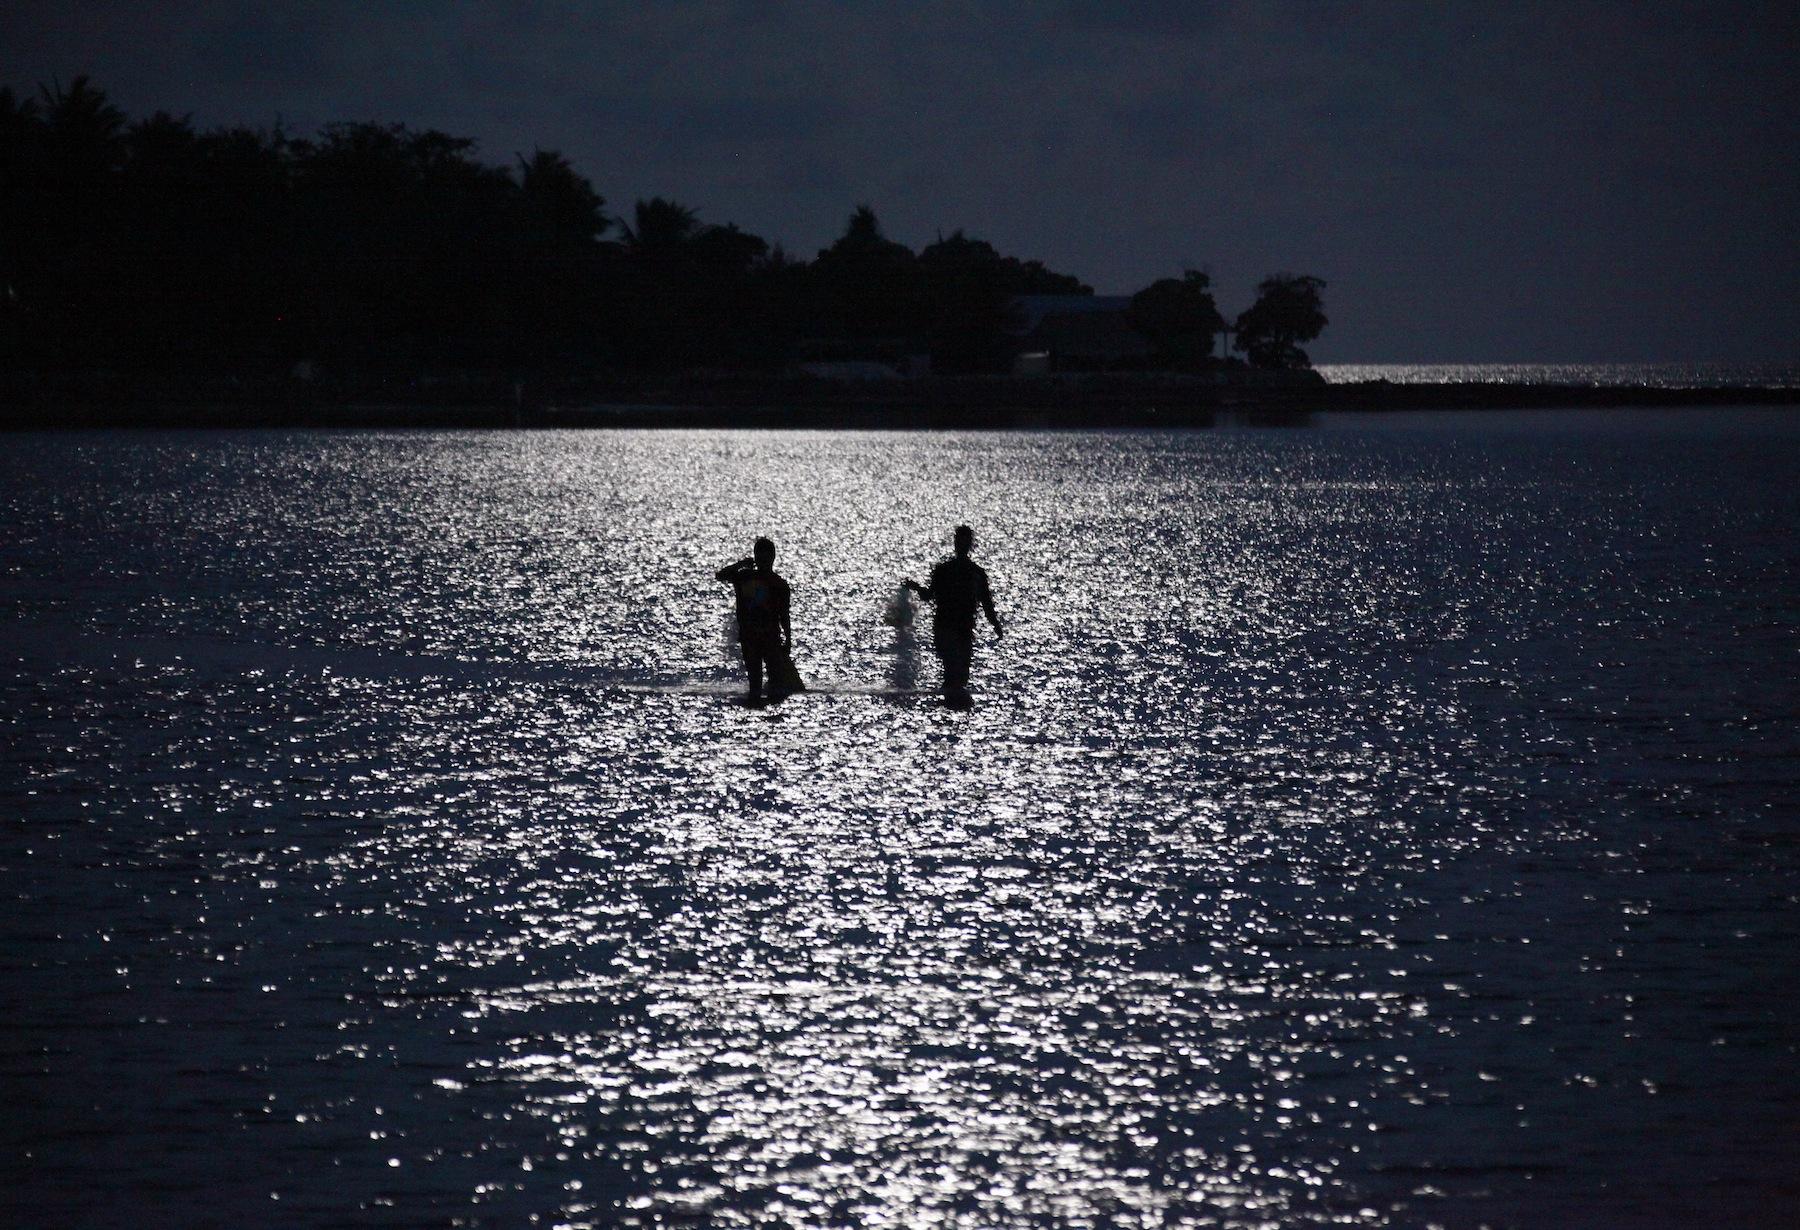 Fishermen are illuminated by the full moon as they prepare to cast their nets near the village of Teaorereke on South Tarawa in the central Pacific island nation of Kiribati May 25, 2013. REUTERS/David Gray (KIRIBATI - Tags: ENVIRONMENT SOCIETY POLITICS) - RTX10NEU